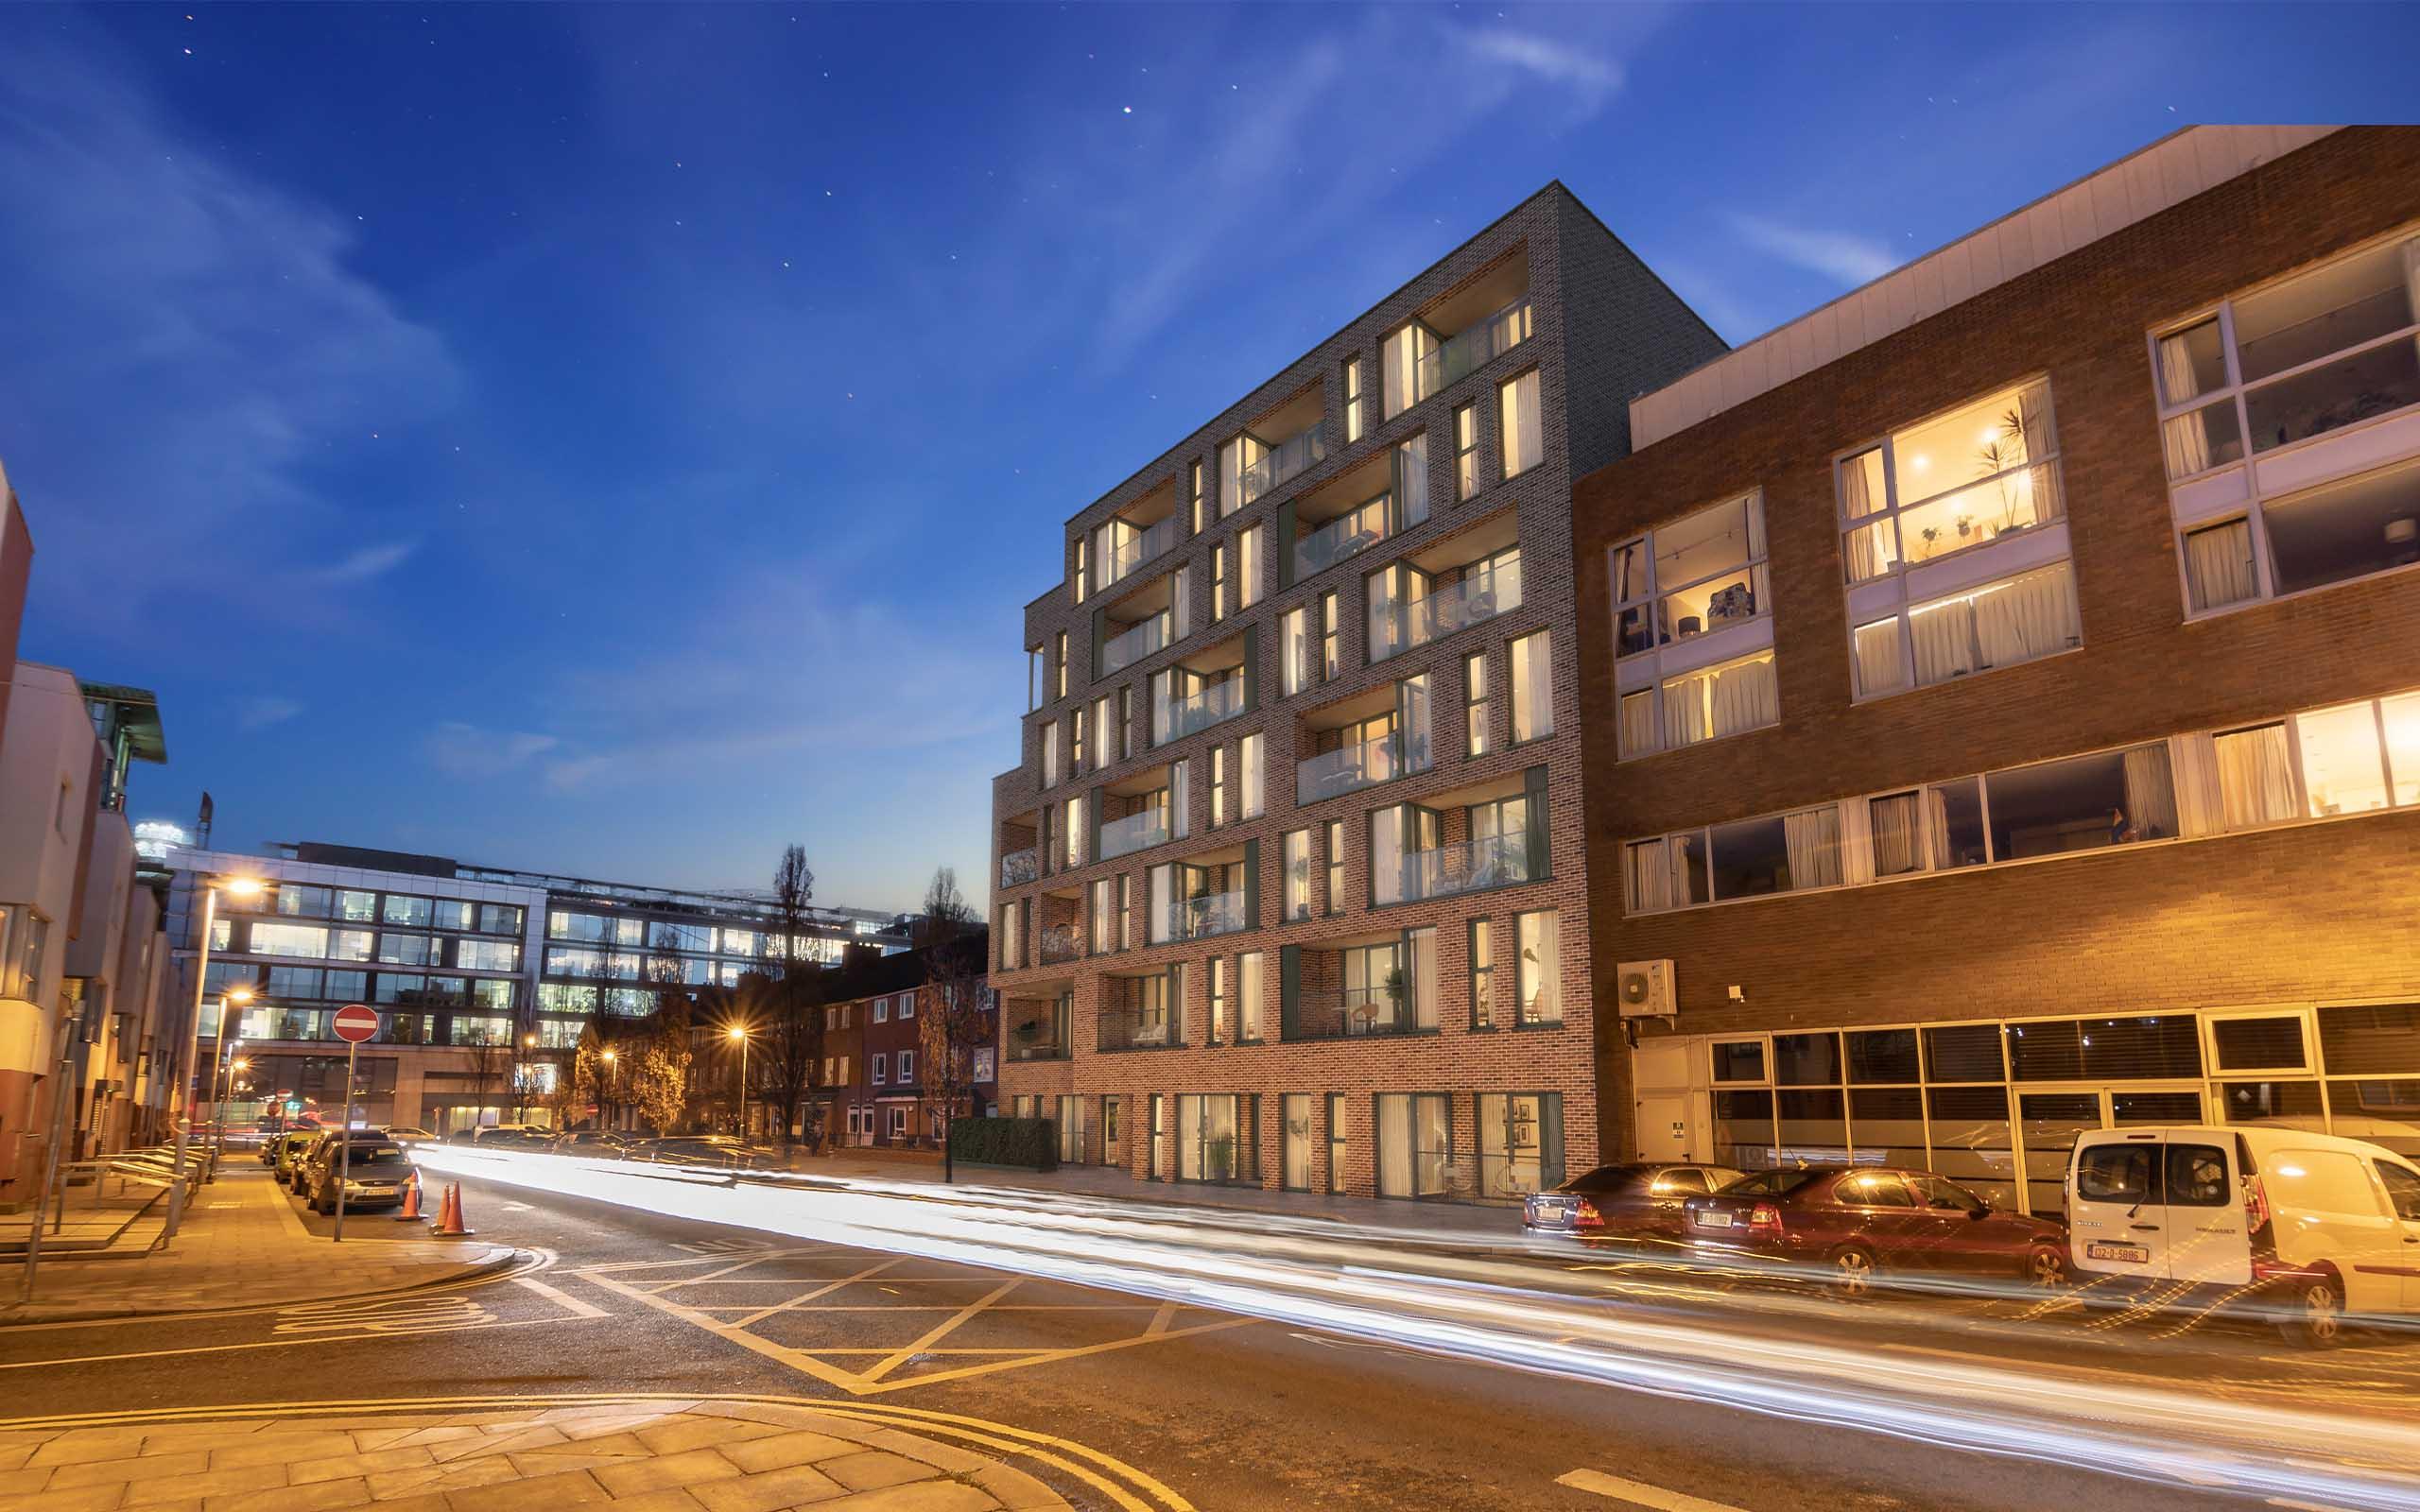 Presentation photomontage of 19/20 Blackhall Street in Smithfield